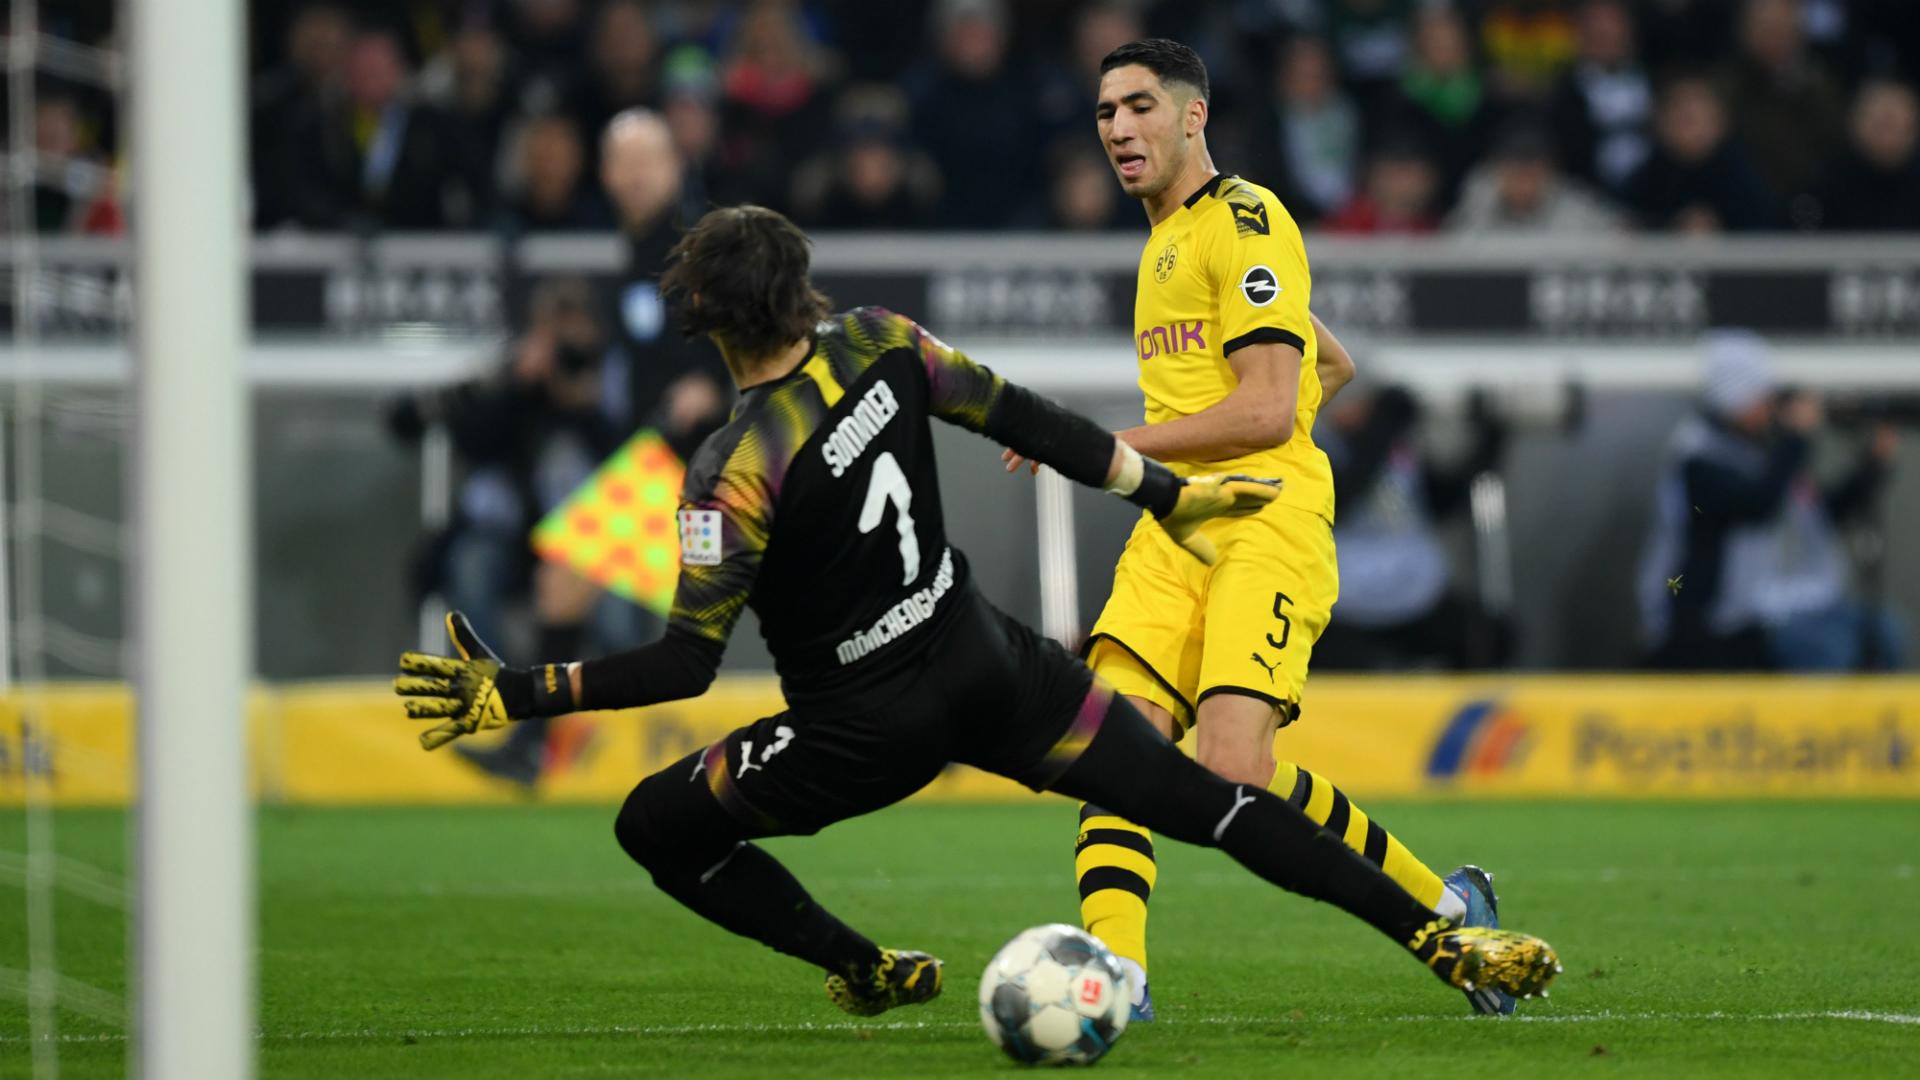 Achraf Hakimi - Borussia Monchengladbach vs Borussia Dortmund - 2019-20